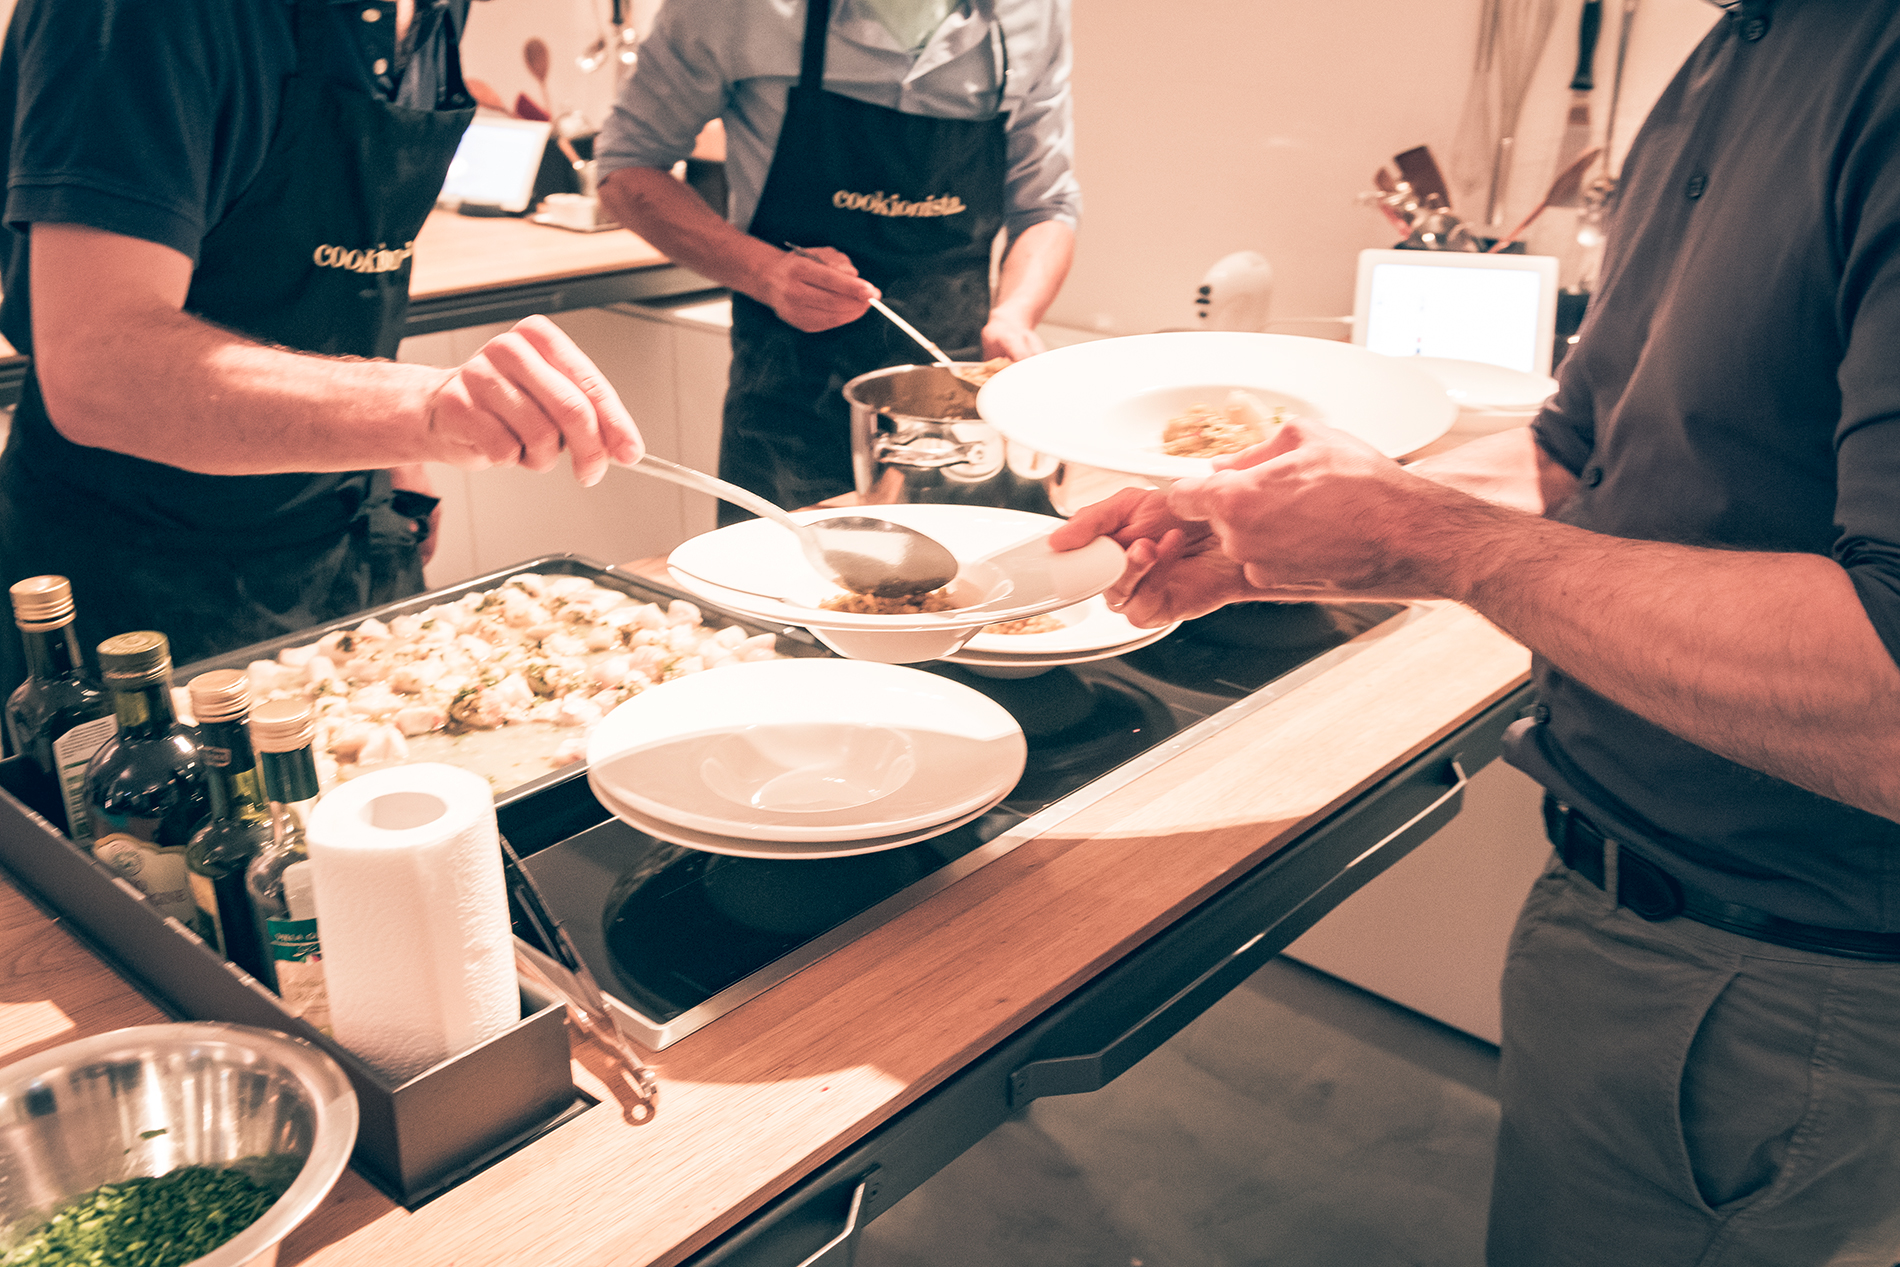 Gruppenevents - zusammen kochen